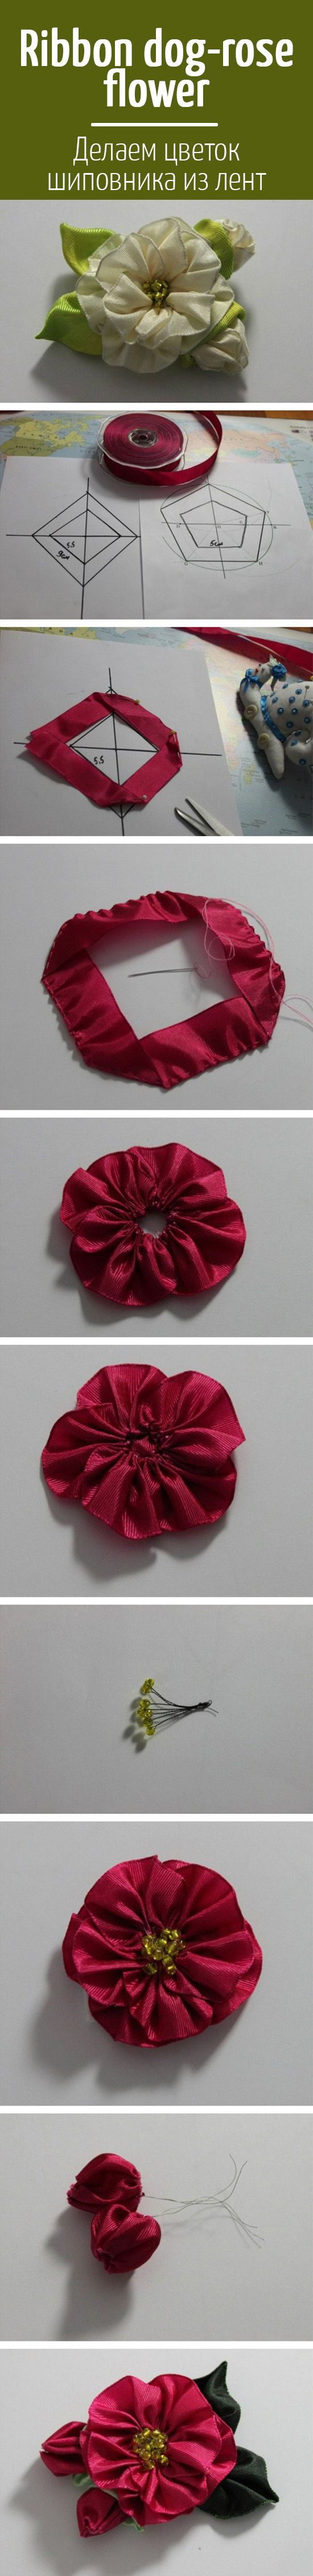 Ribbon dog rose flower ДеРаем цветок шиповника из Рент